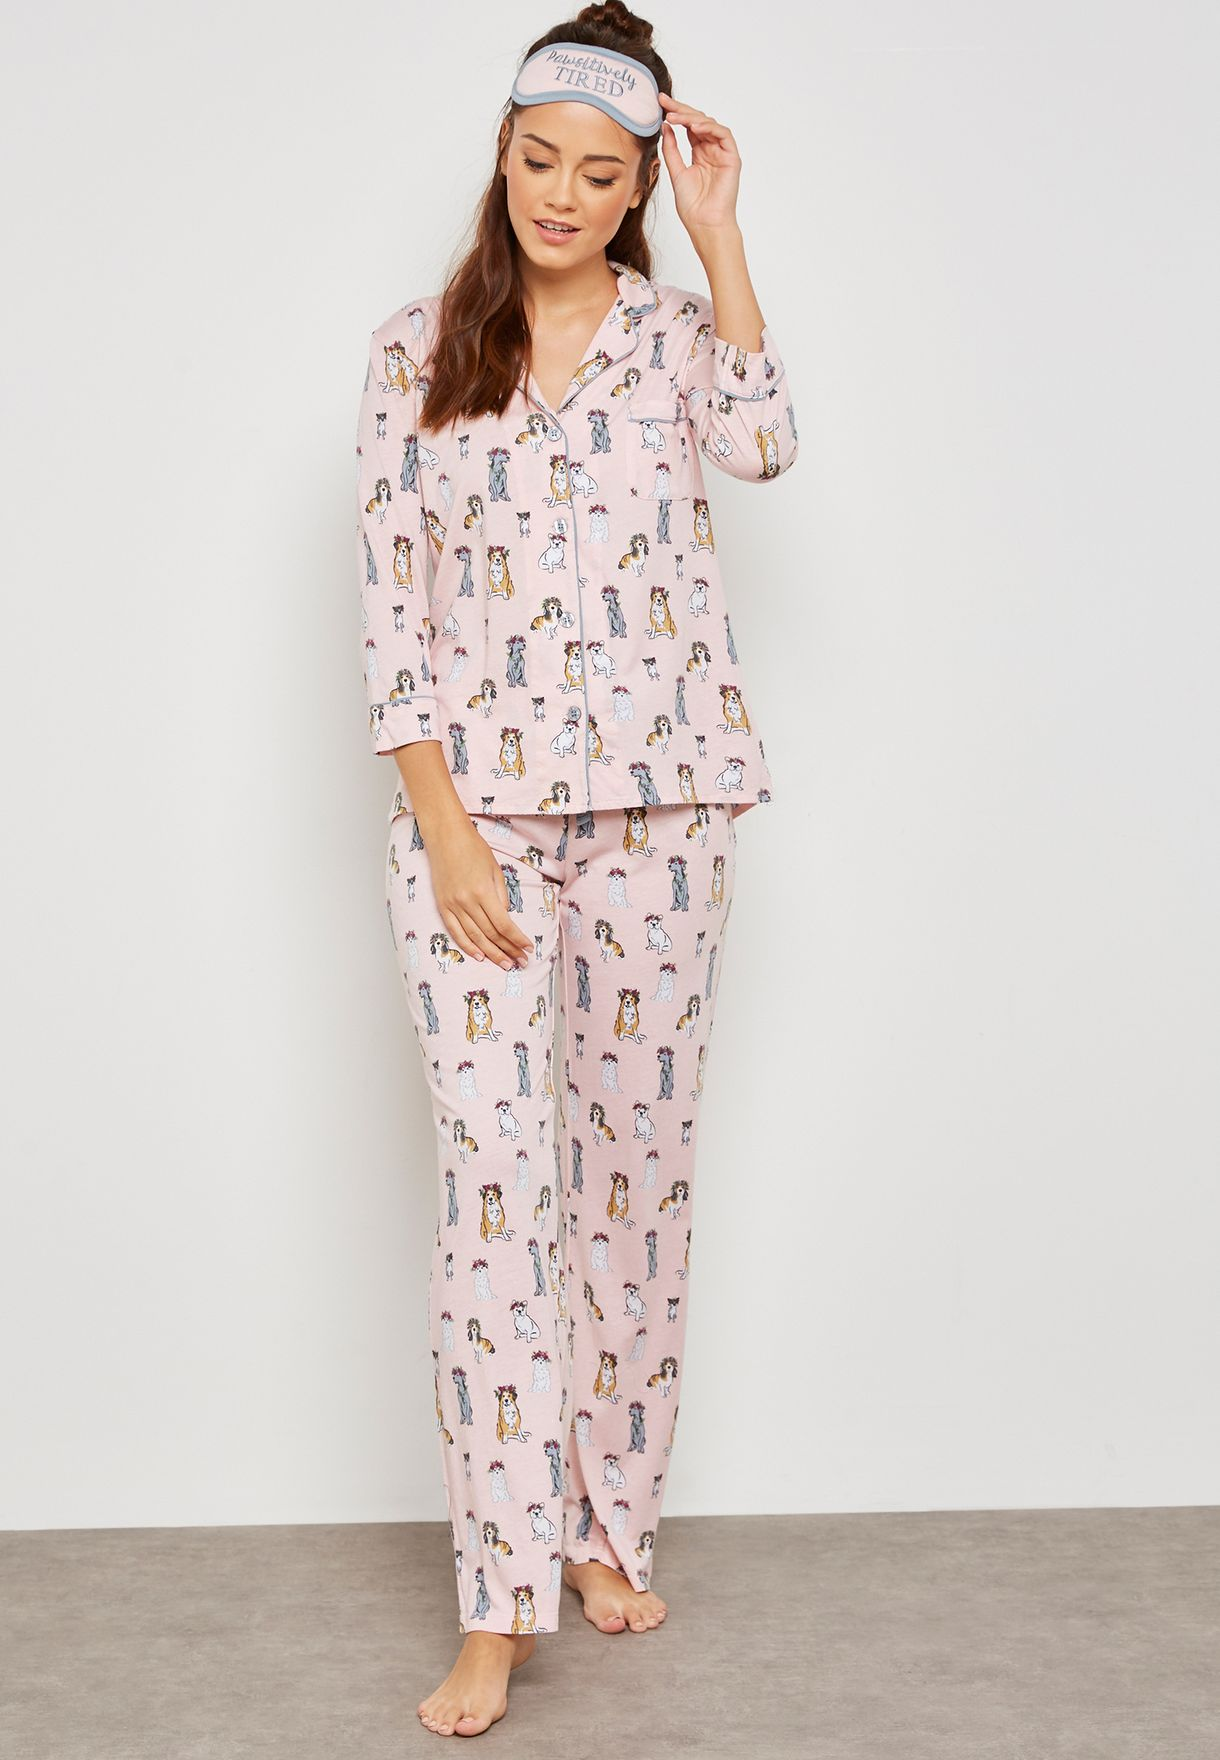 0ac14c6fdc Shop Pj Salvage prints Puppy Pyjama Set RJPPP for Women in UAE ...